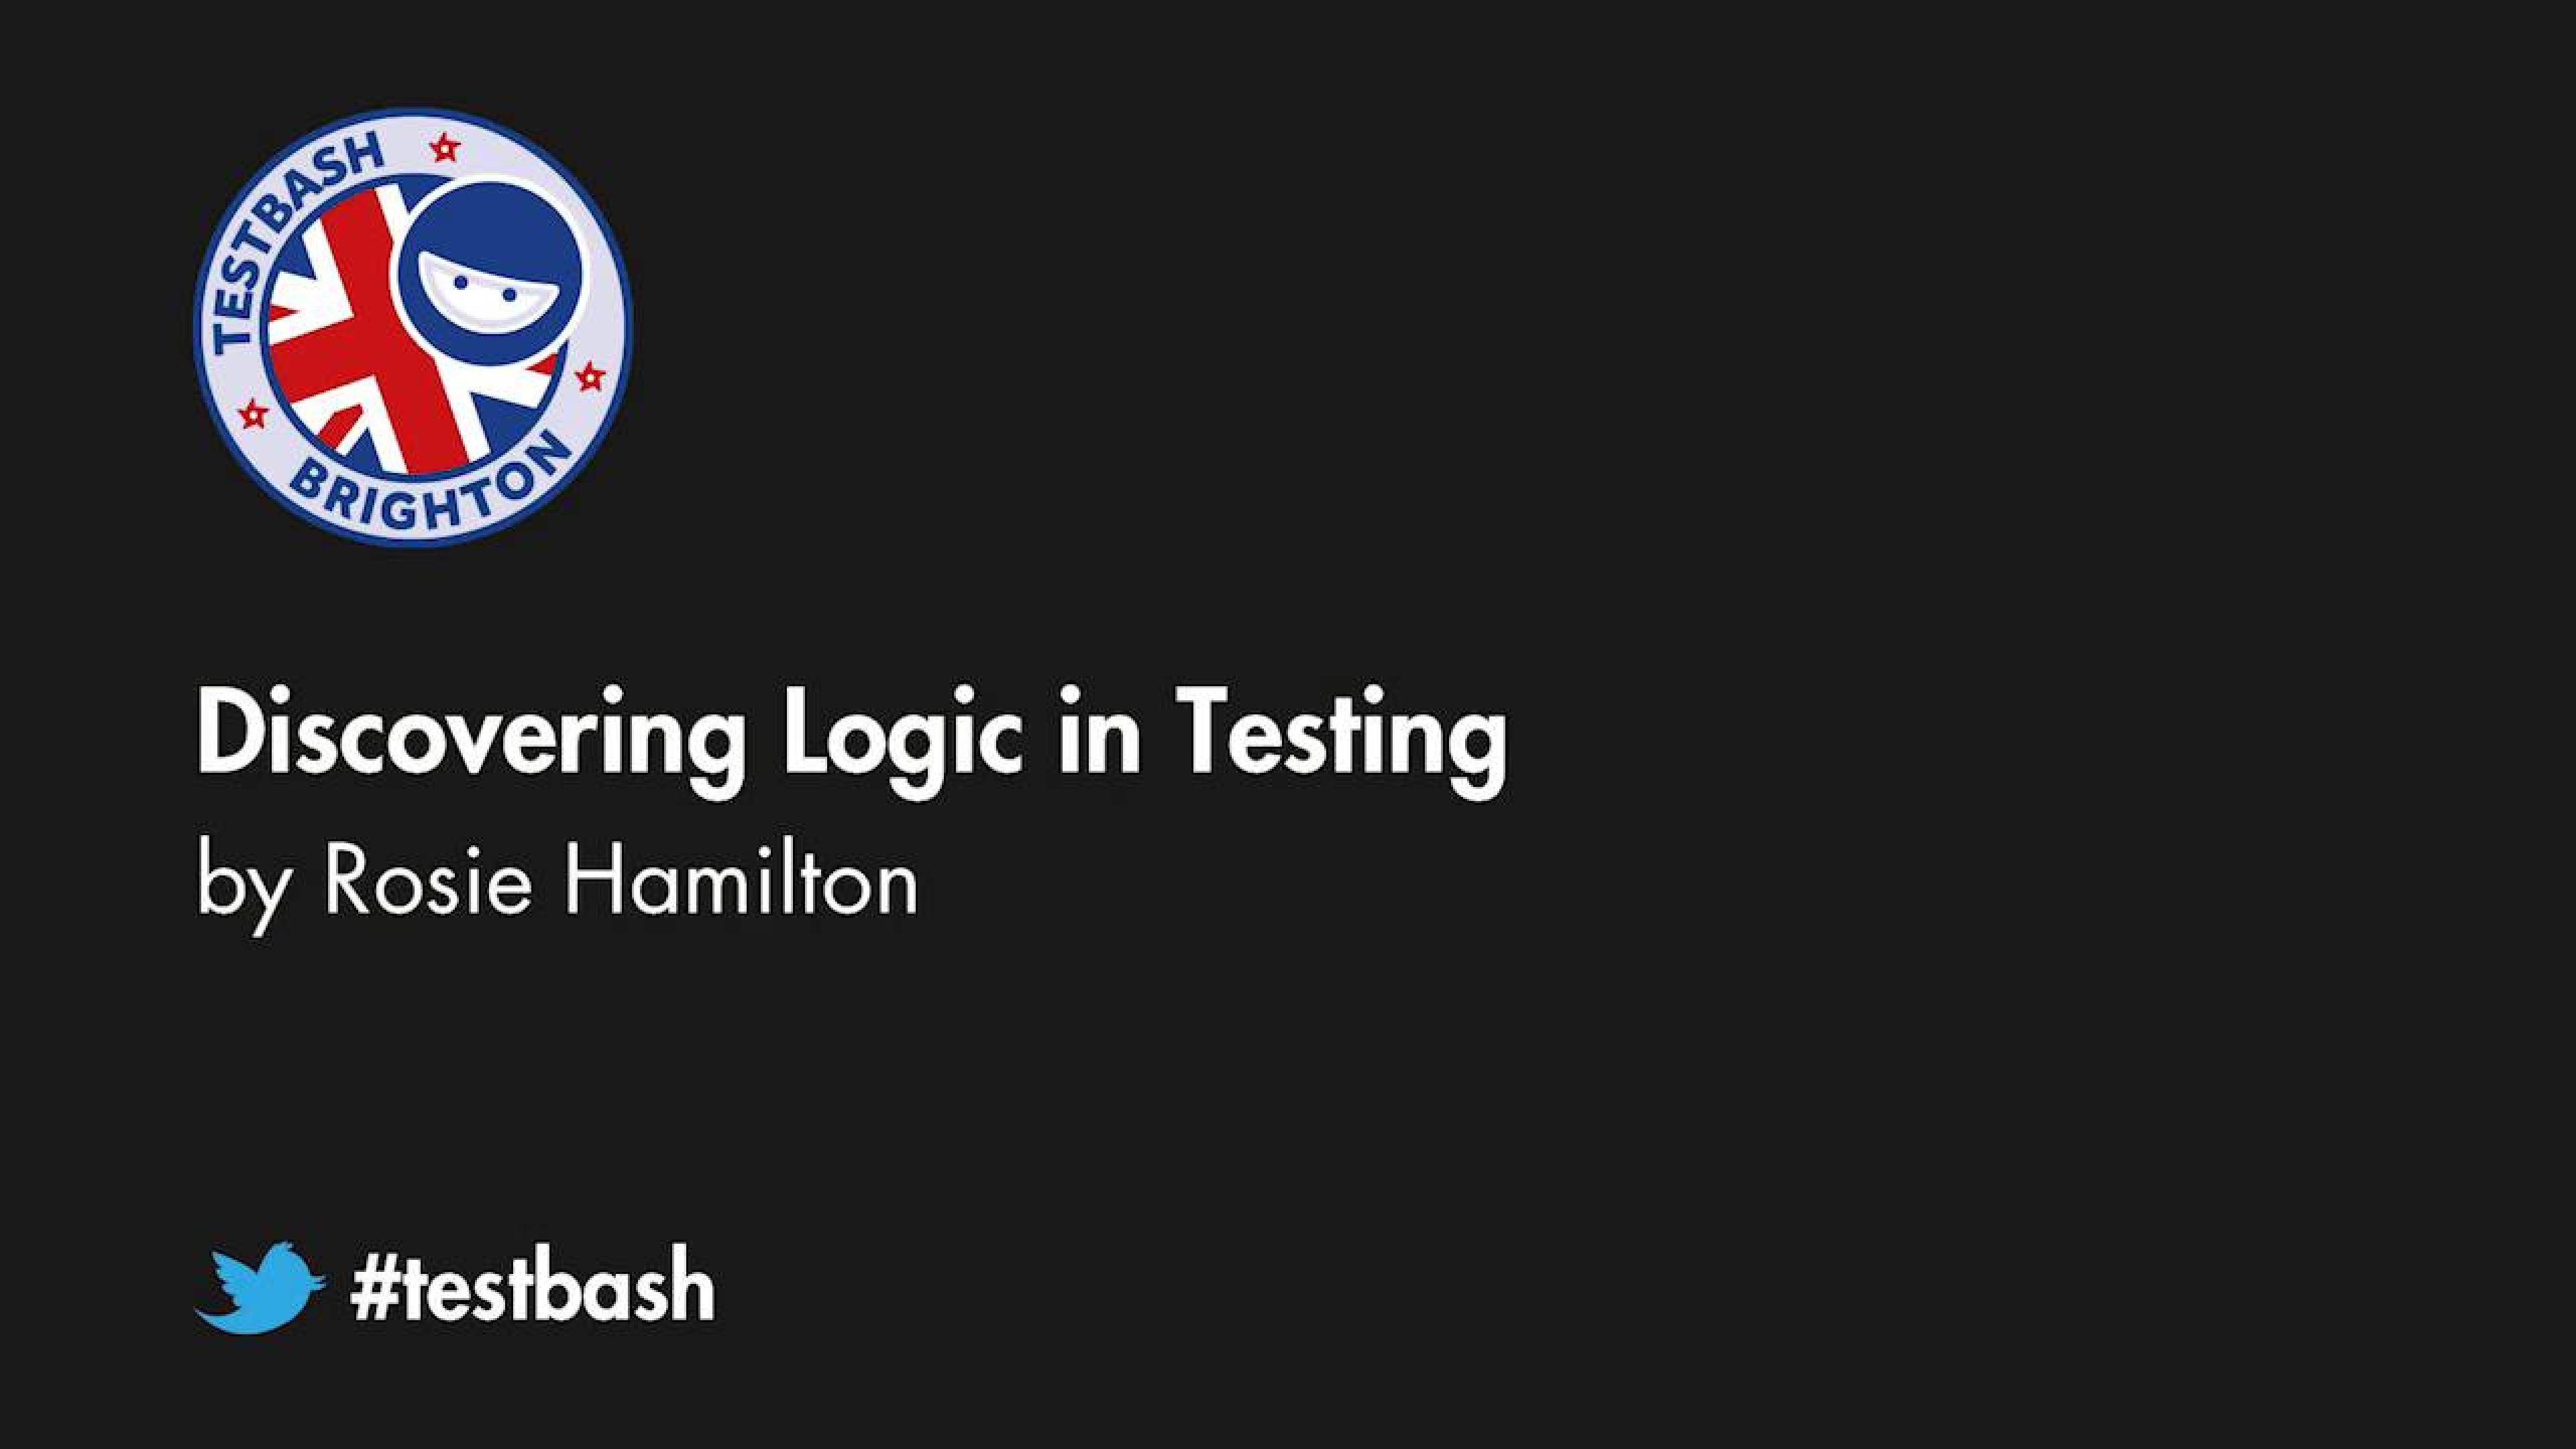 Discovering Logic In Testing - Rosie Hamilton